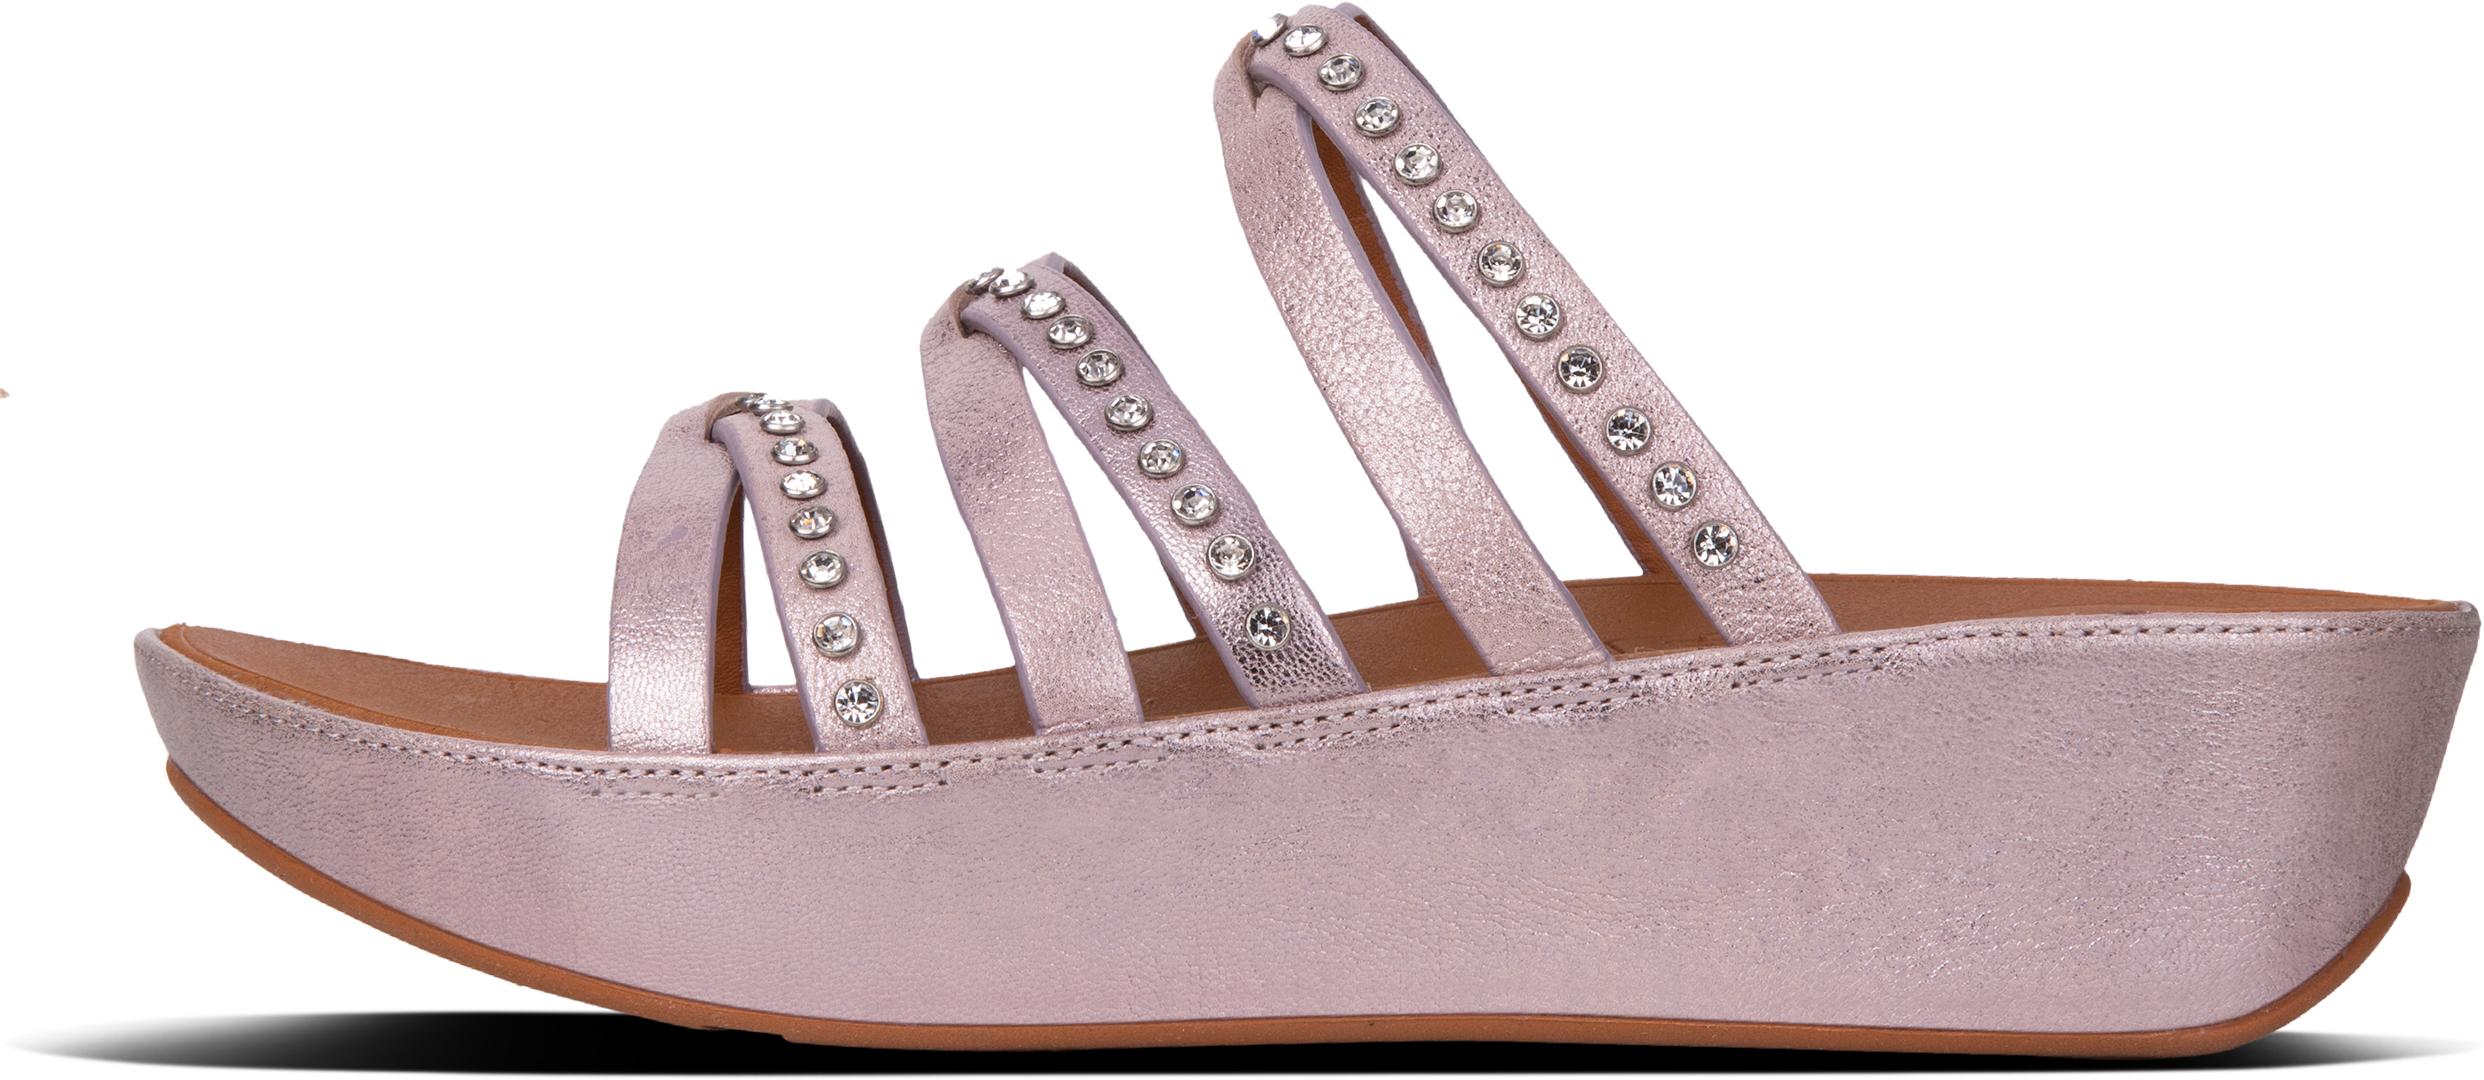 5cdfc258fb01 Fitflop LINNY SLIDE CRYSTAL Sandal 2018 blush metallic nude ...